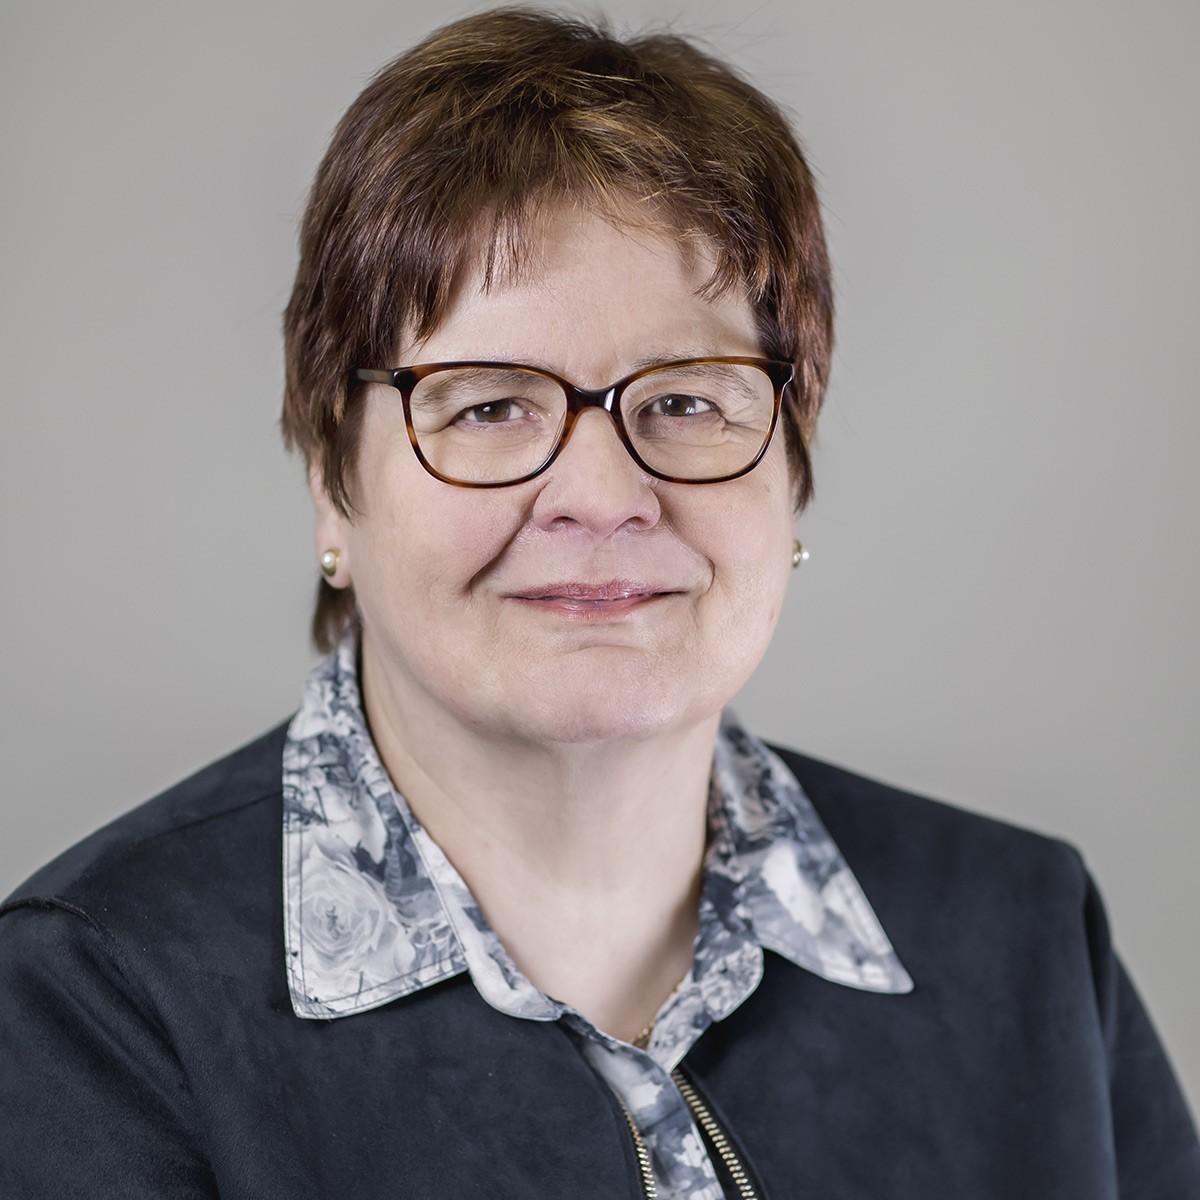 Angela Kettner